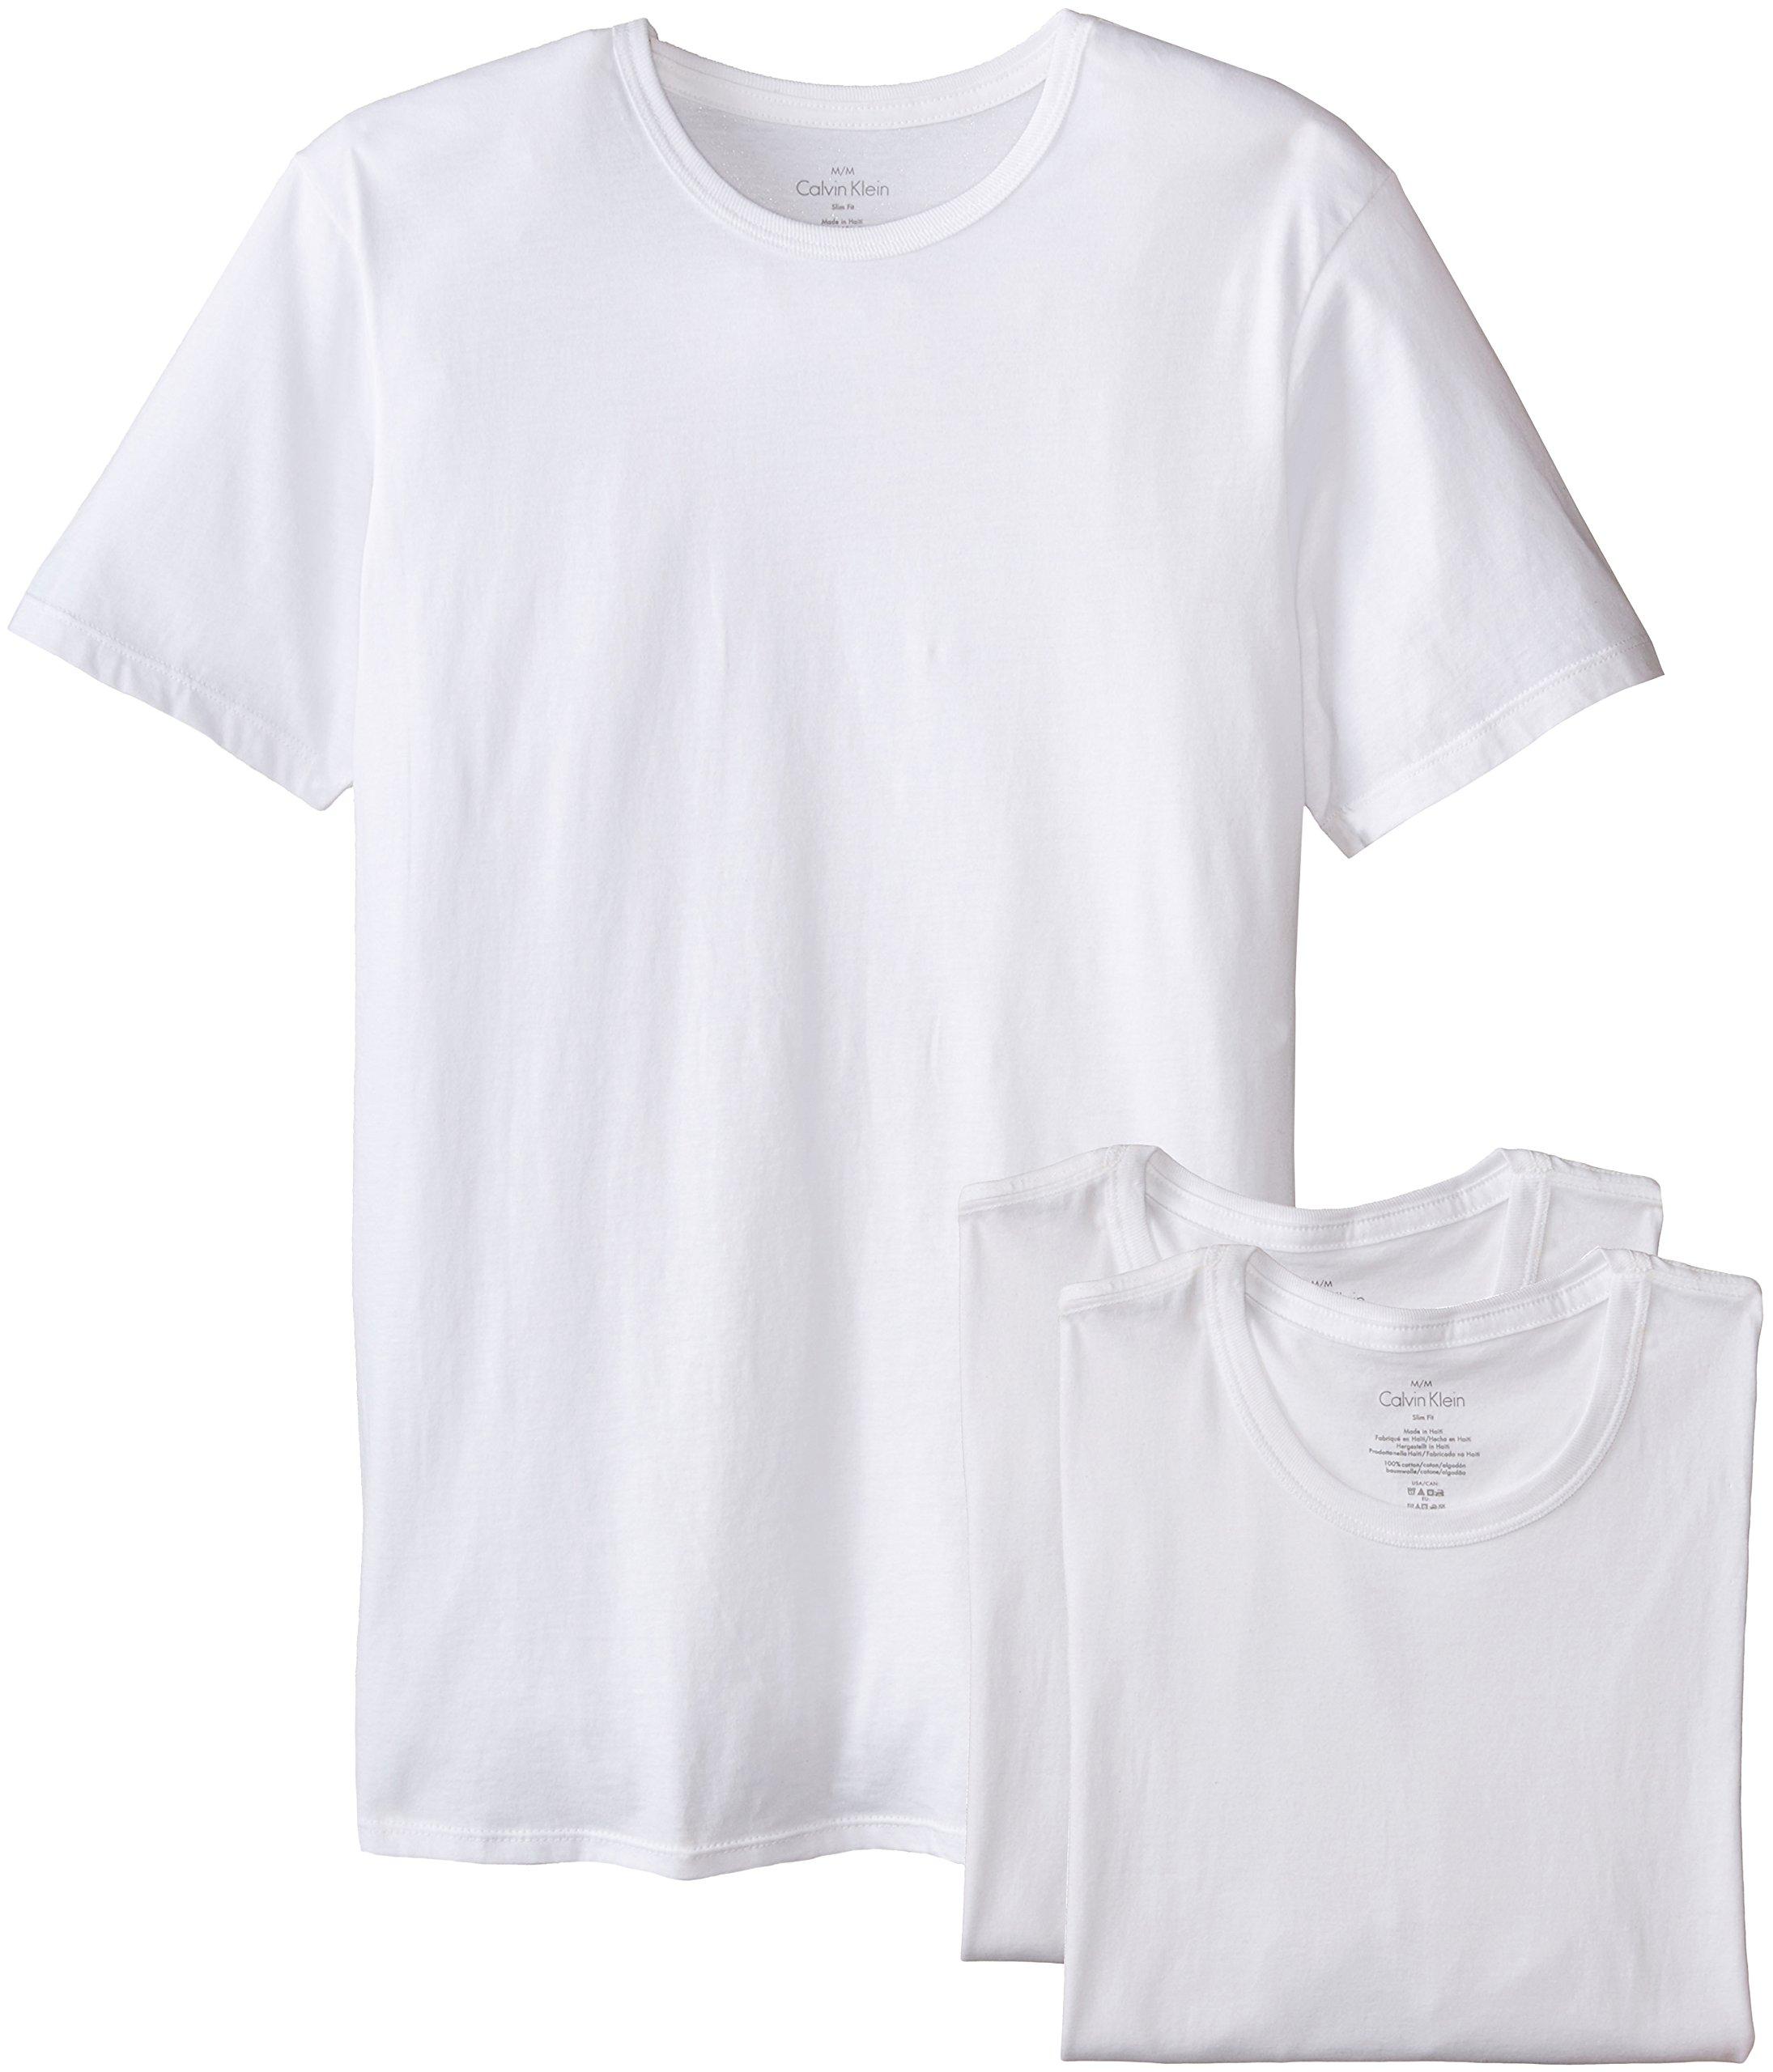 Calvin Klein Men's Cotton Classics Slim Fit  Crew Neck T-Shirt, White, Large by Calvin Klein